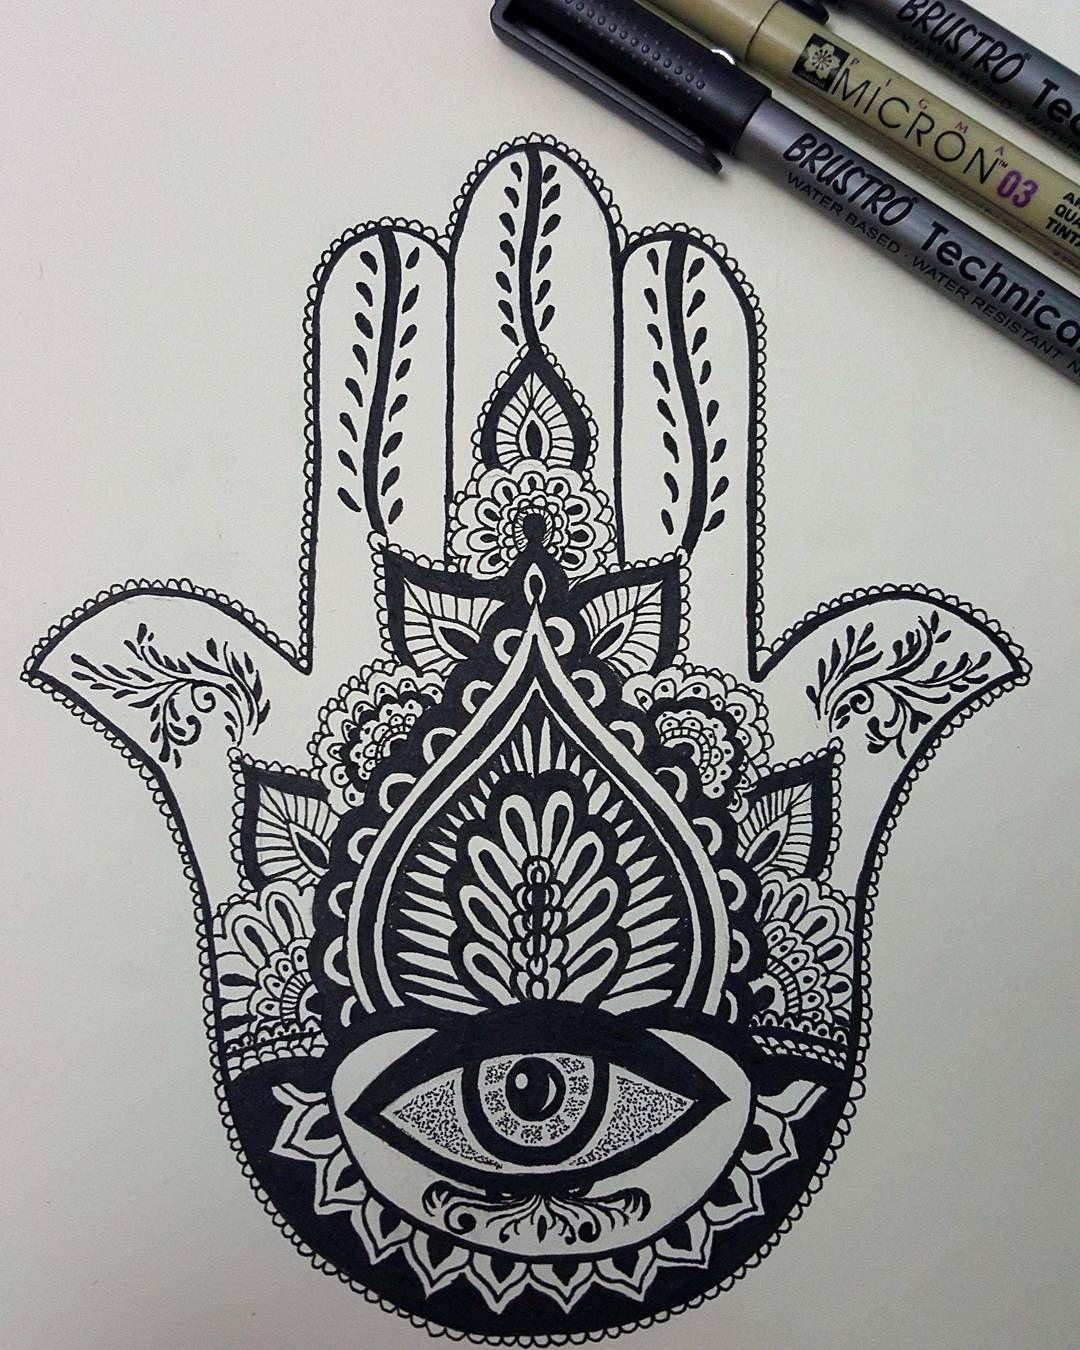 Hamsa Hand Tattoo Designs (182)